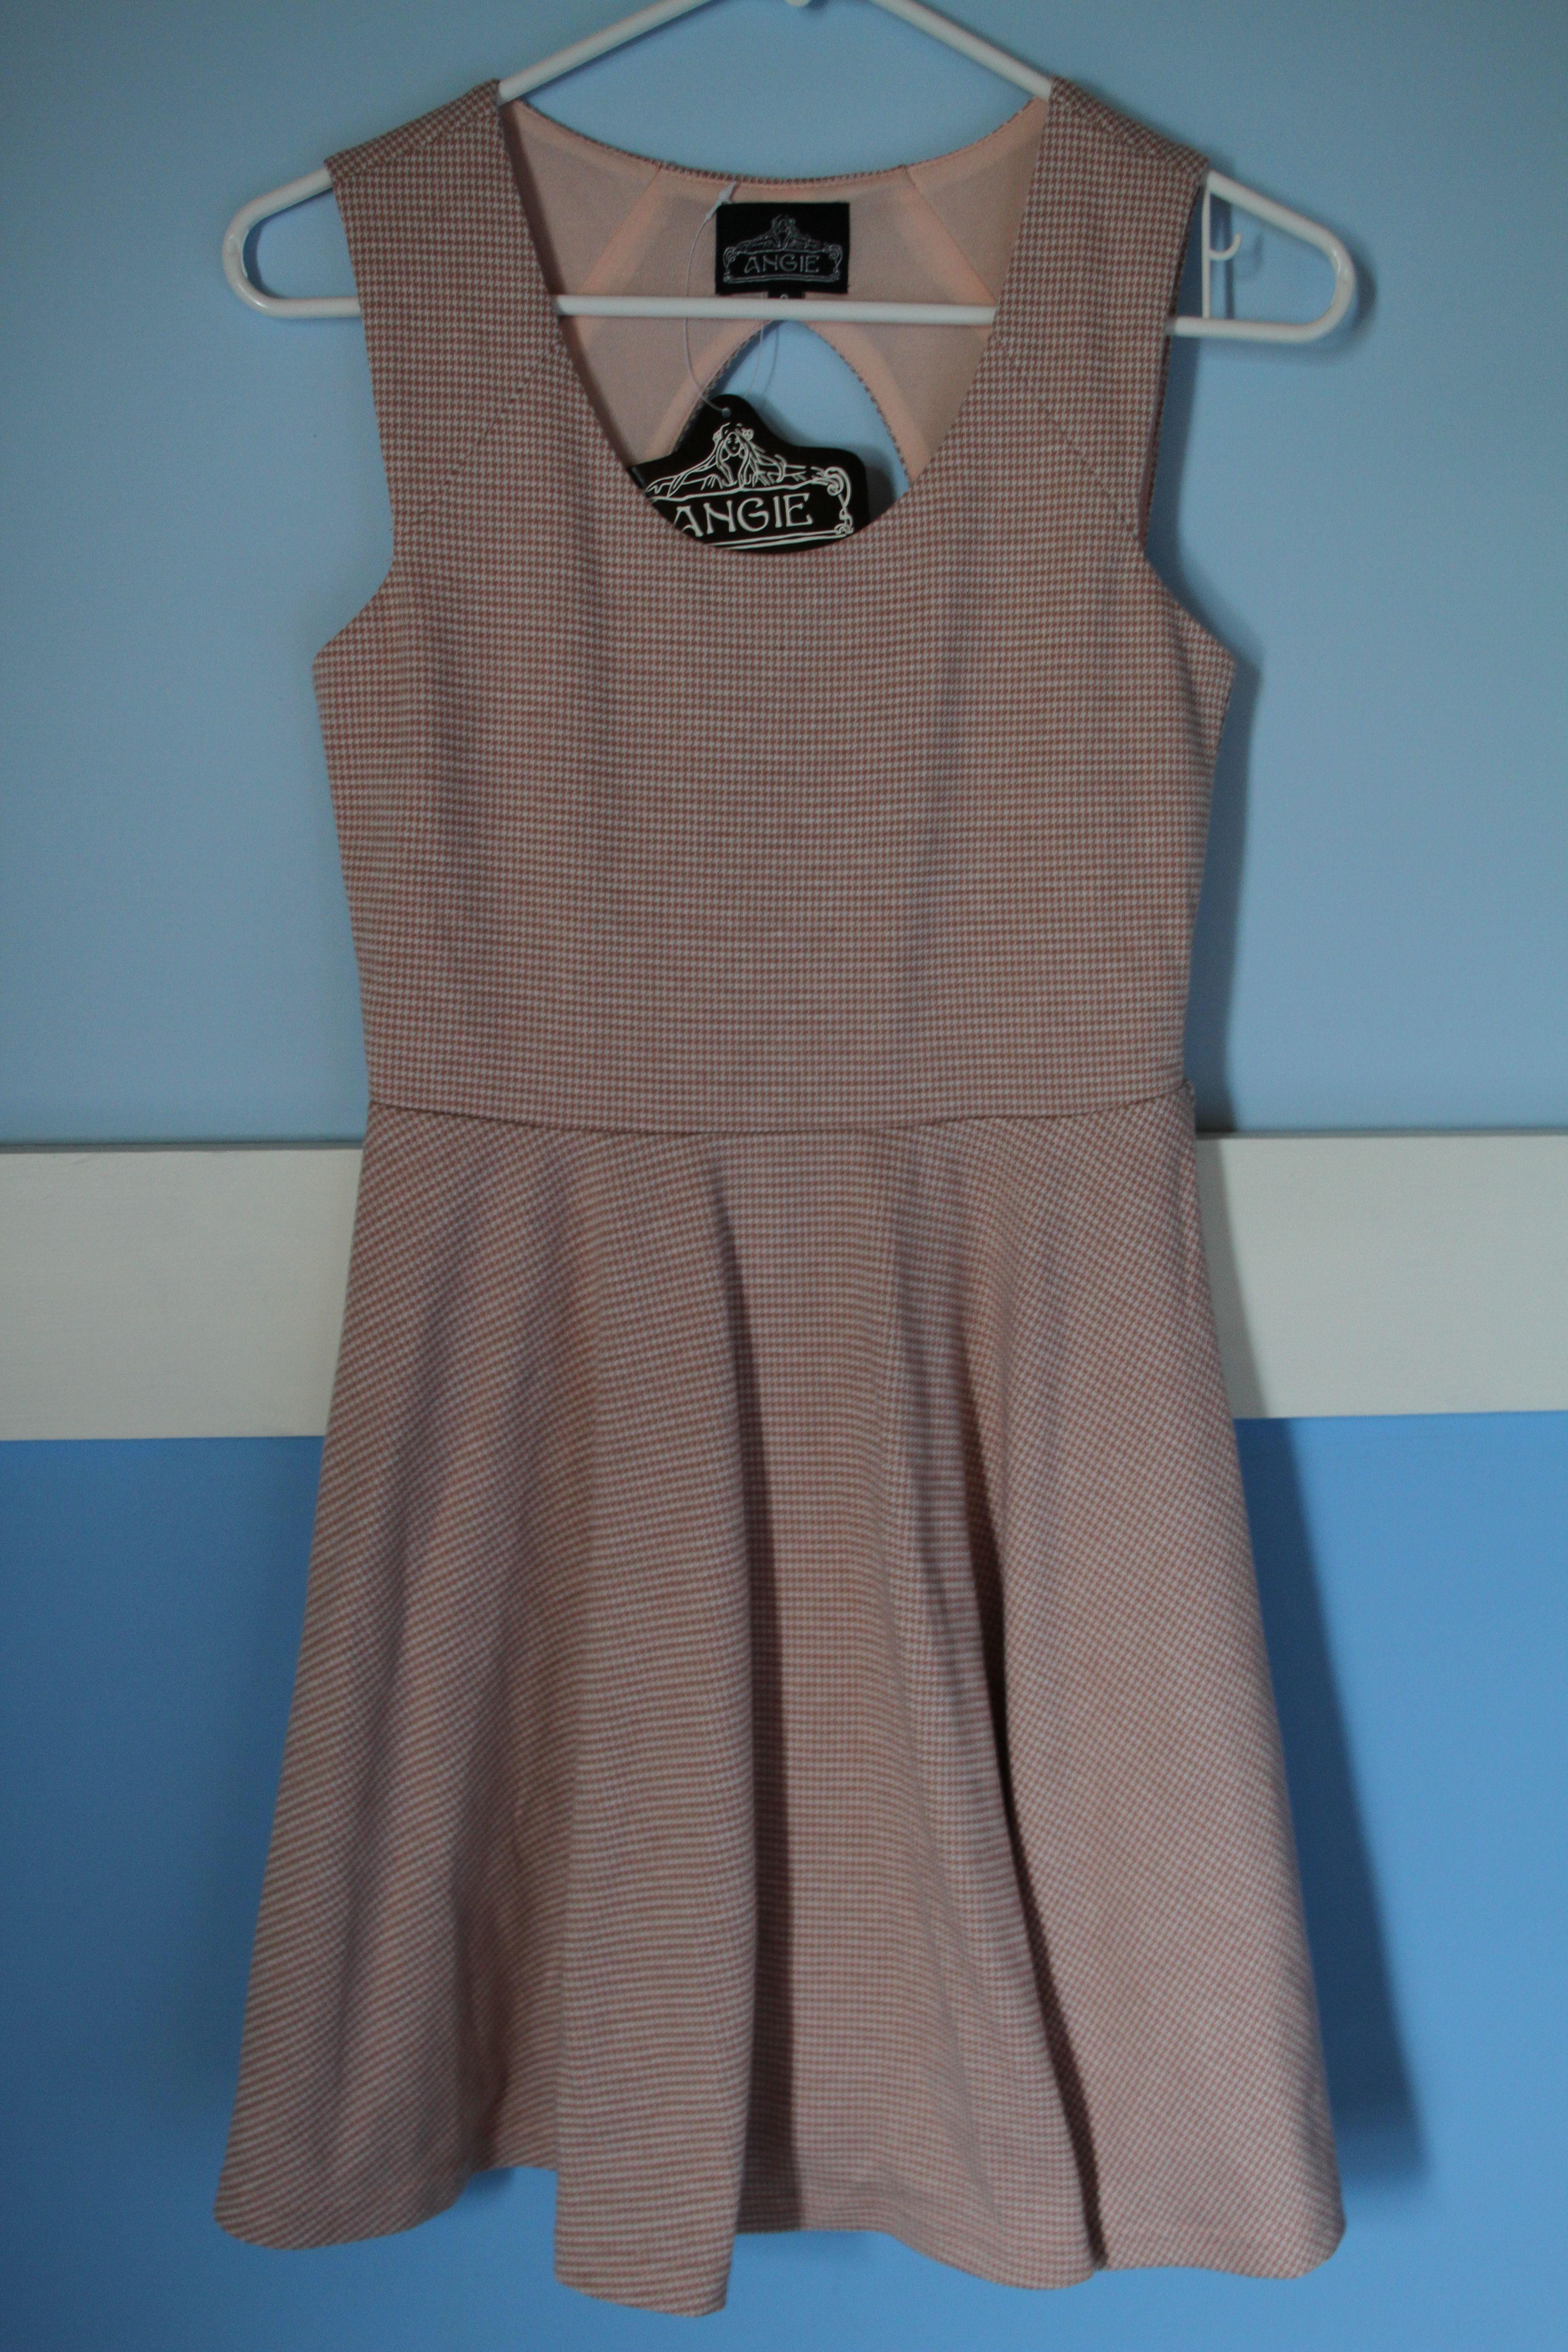 Small Pinkwhite Tiny Print Houndstooth DressSize Angie 22 9eWDIYEH2